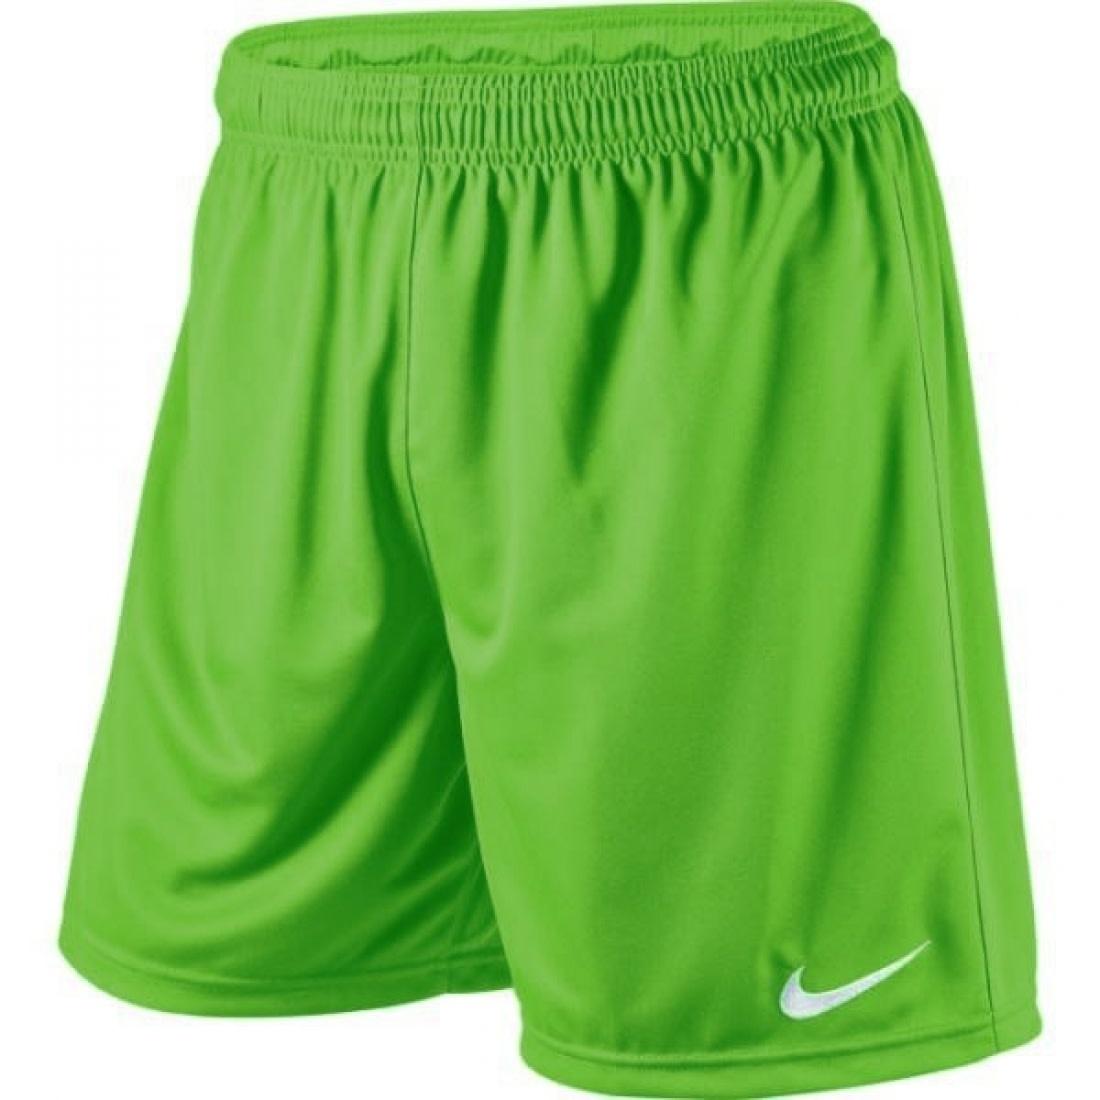 Nike NIKE Park Knit Short SR light green